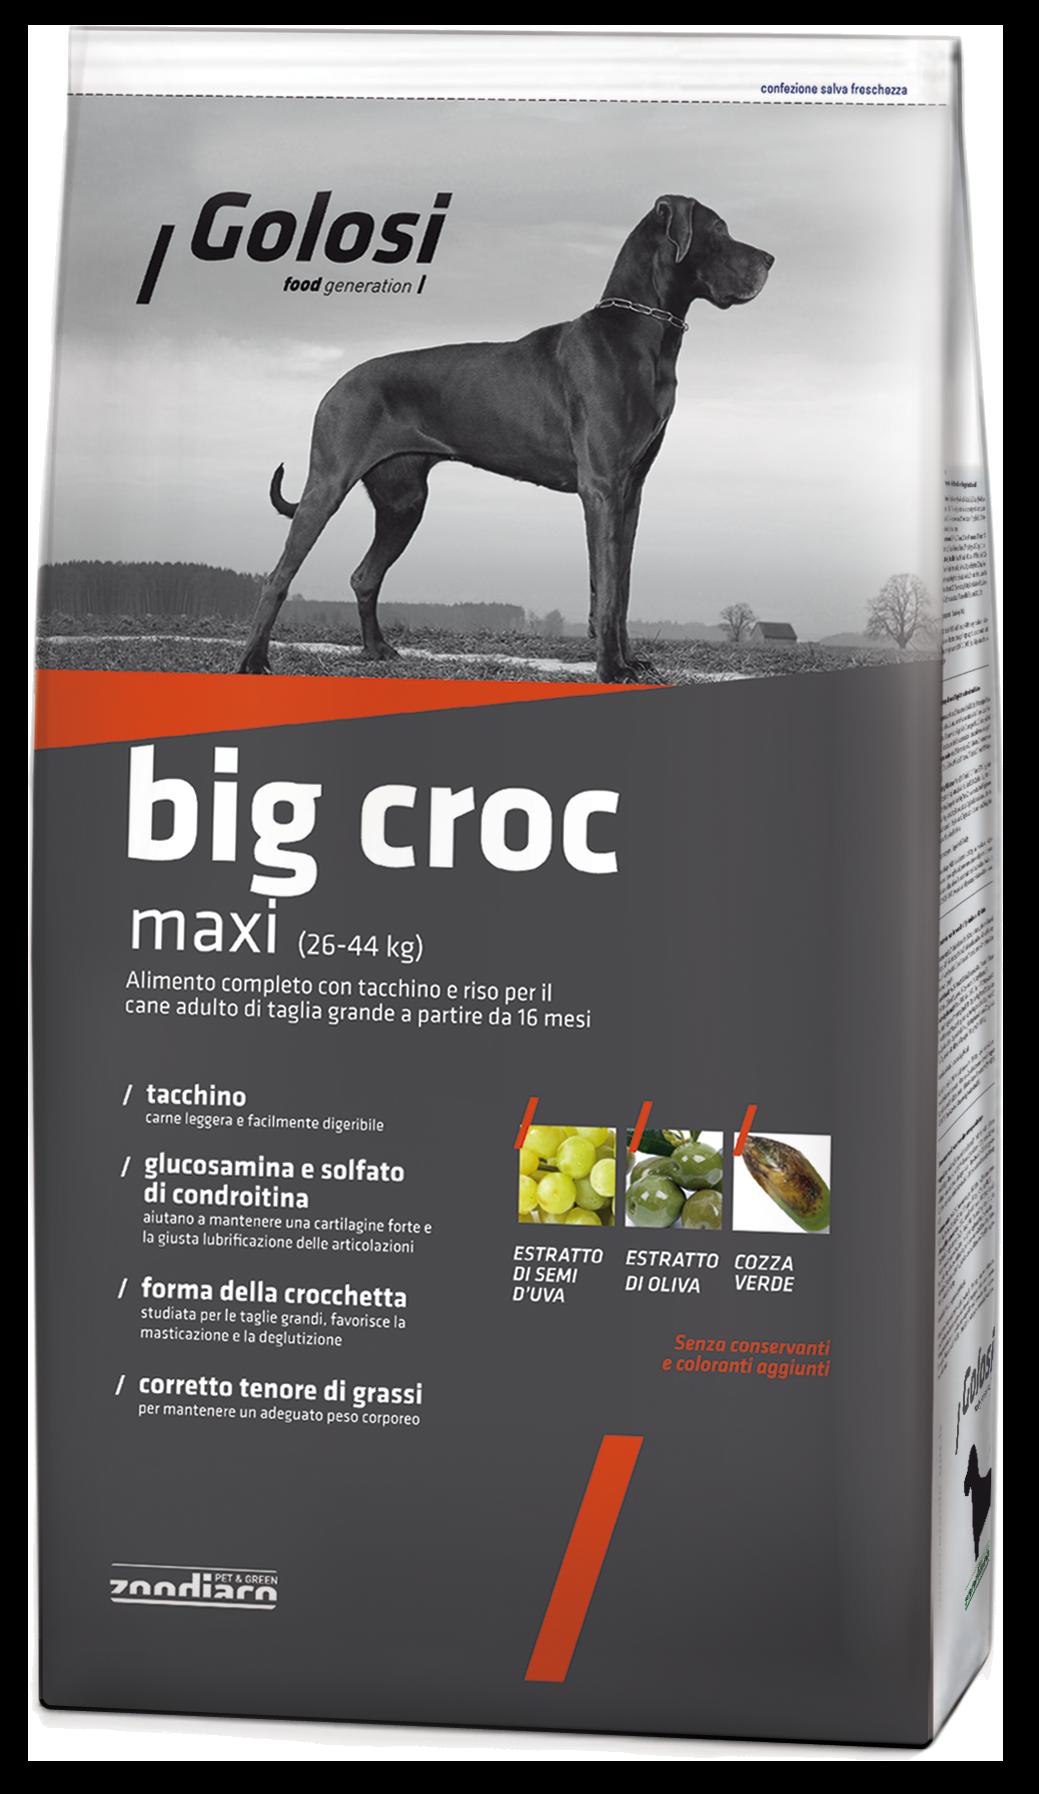 Golosi Maksi Croc корм для собак со вкусом индейки и риса, 12кг